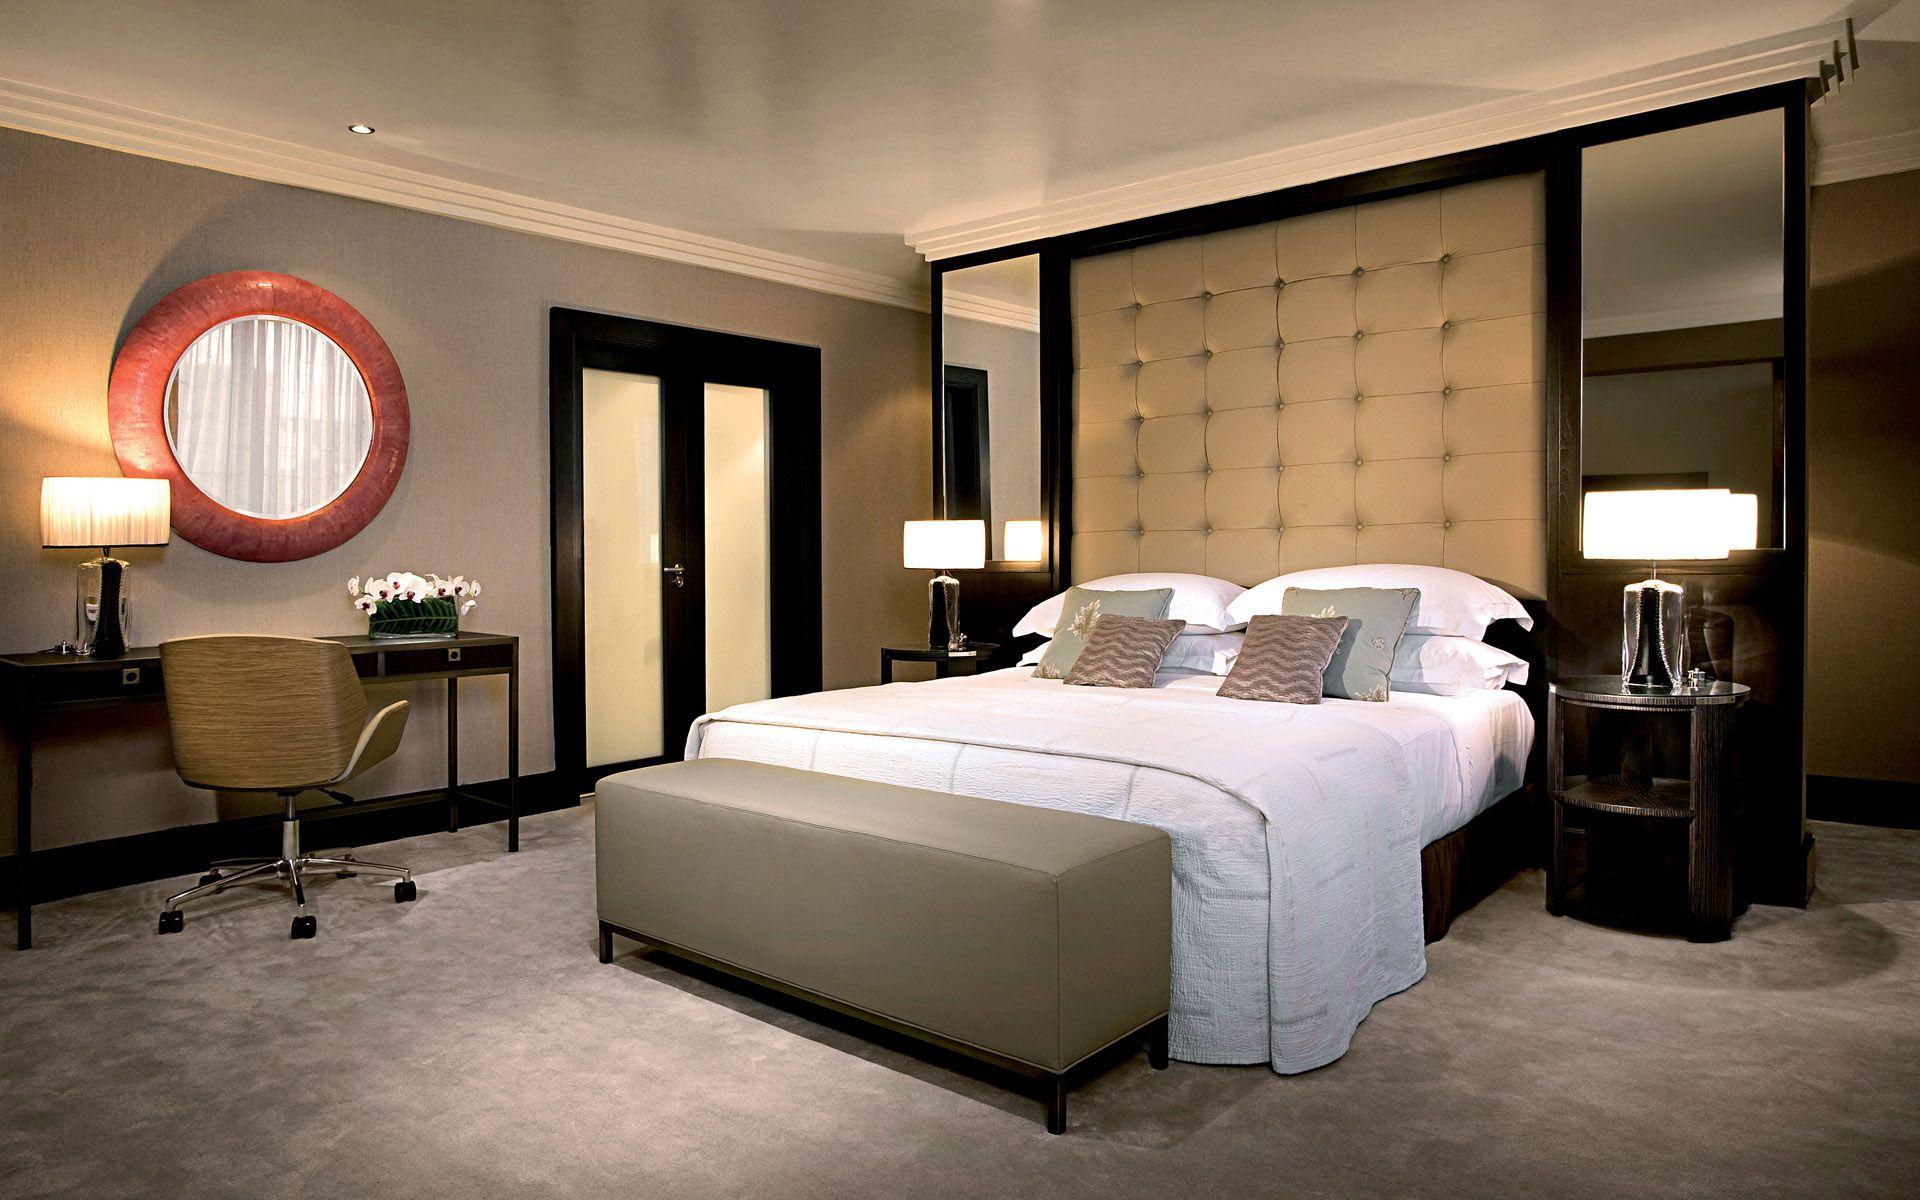 diy ideen schlafzimmer pinterest - Google Търсене | Bedroom ideas ...